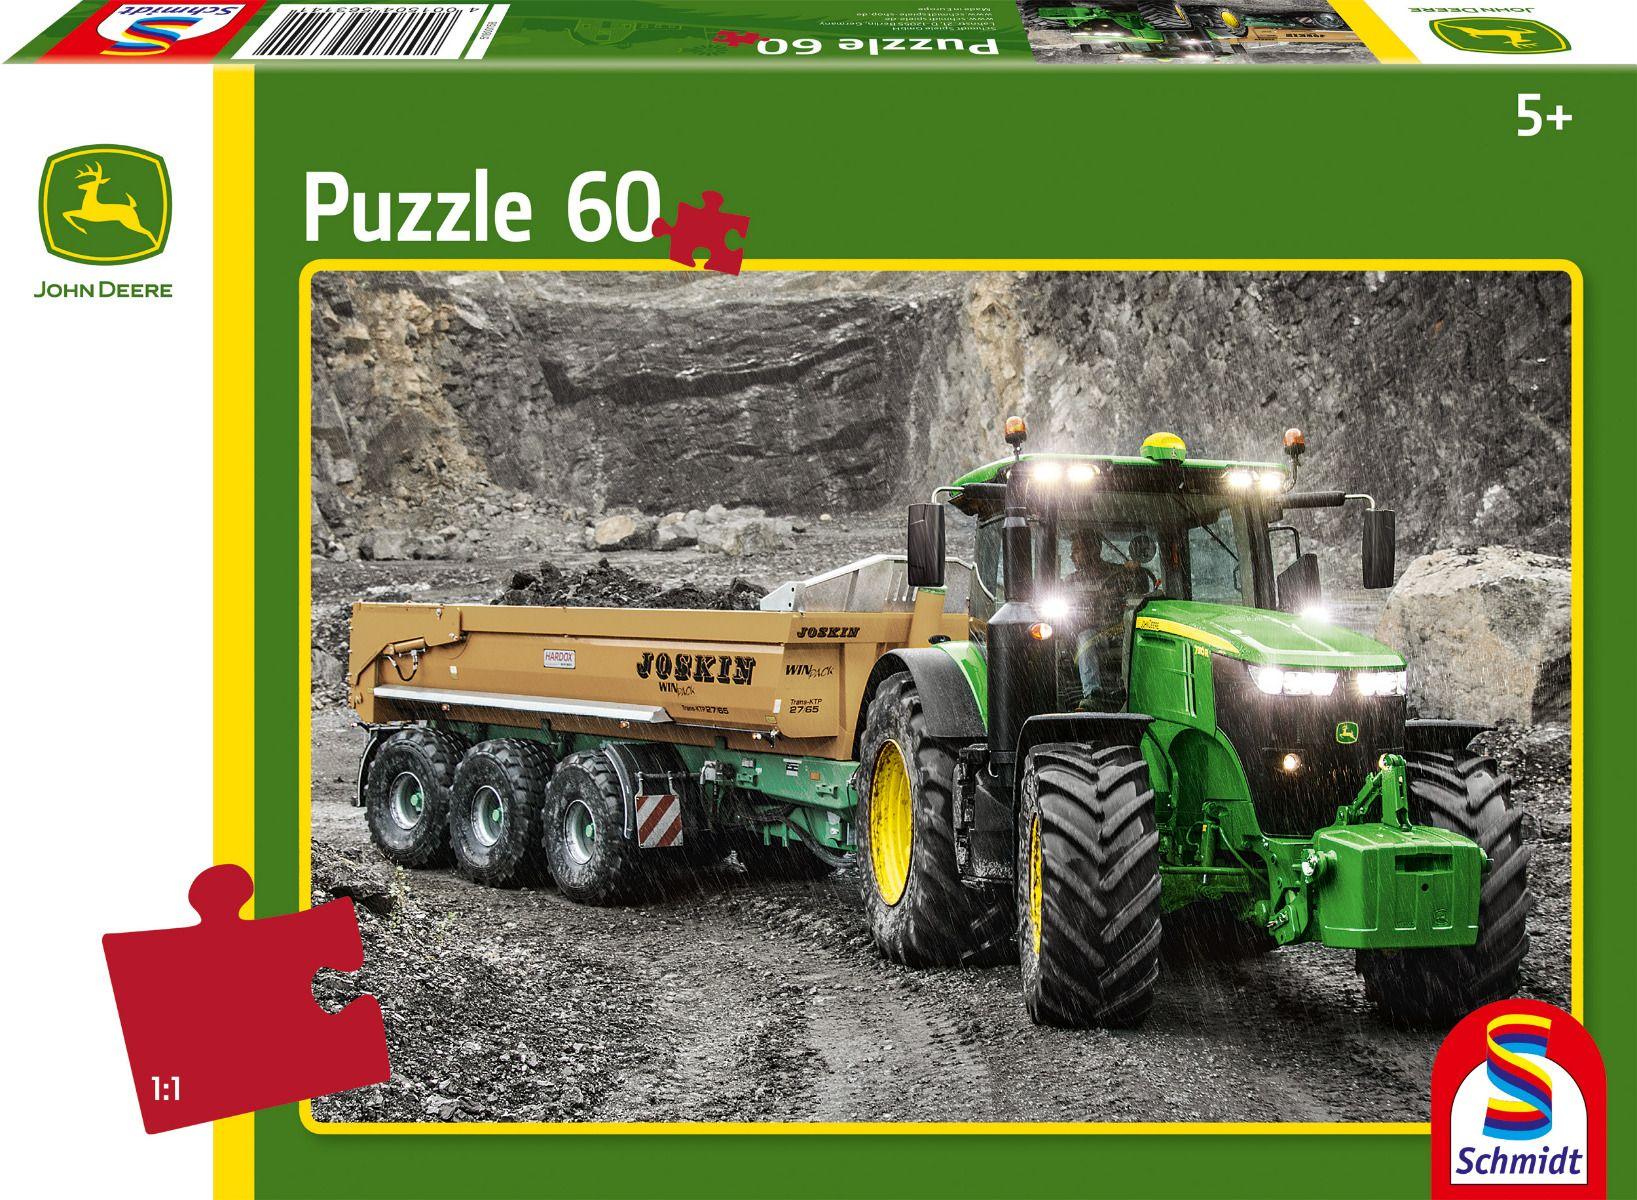 John Deere Tractor 7310R, 60 pcs